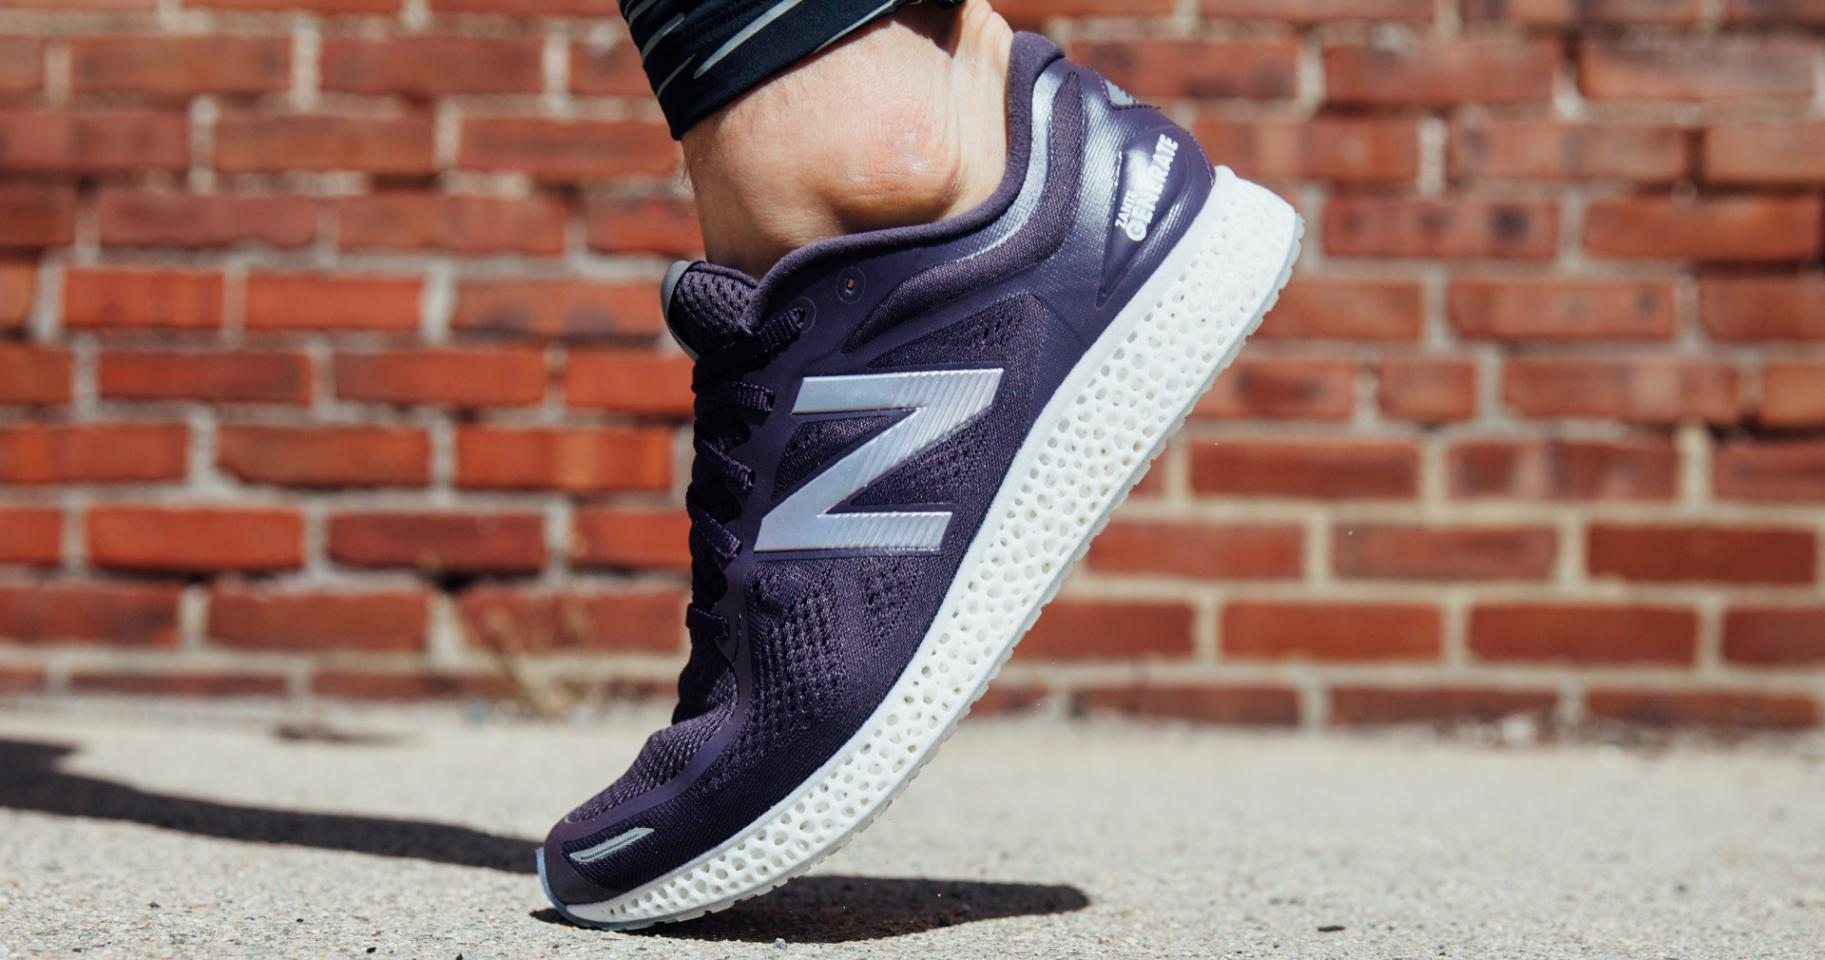 New Balance® Insoles (November 2020